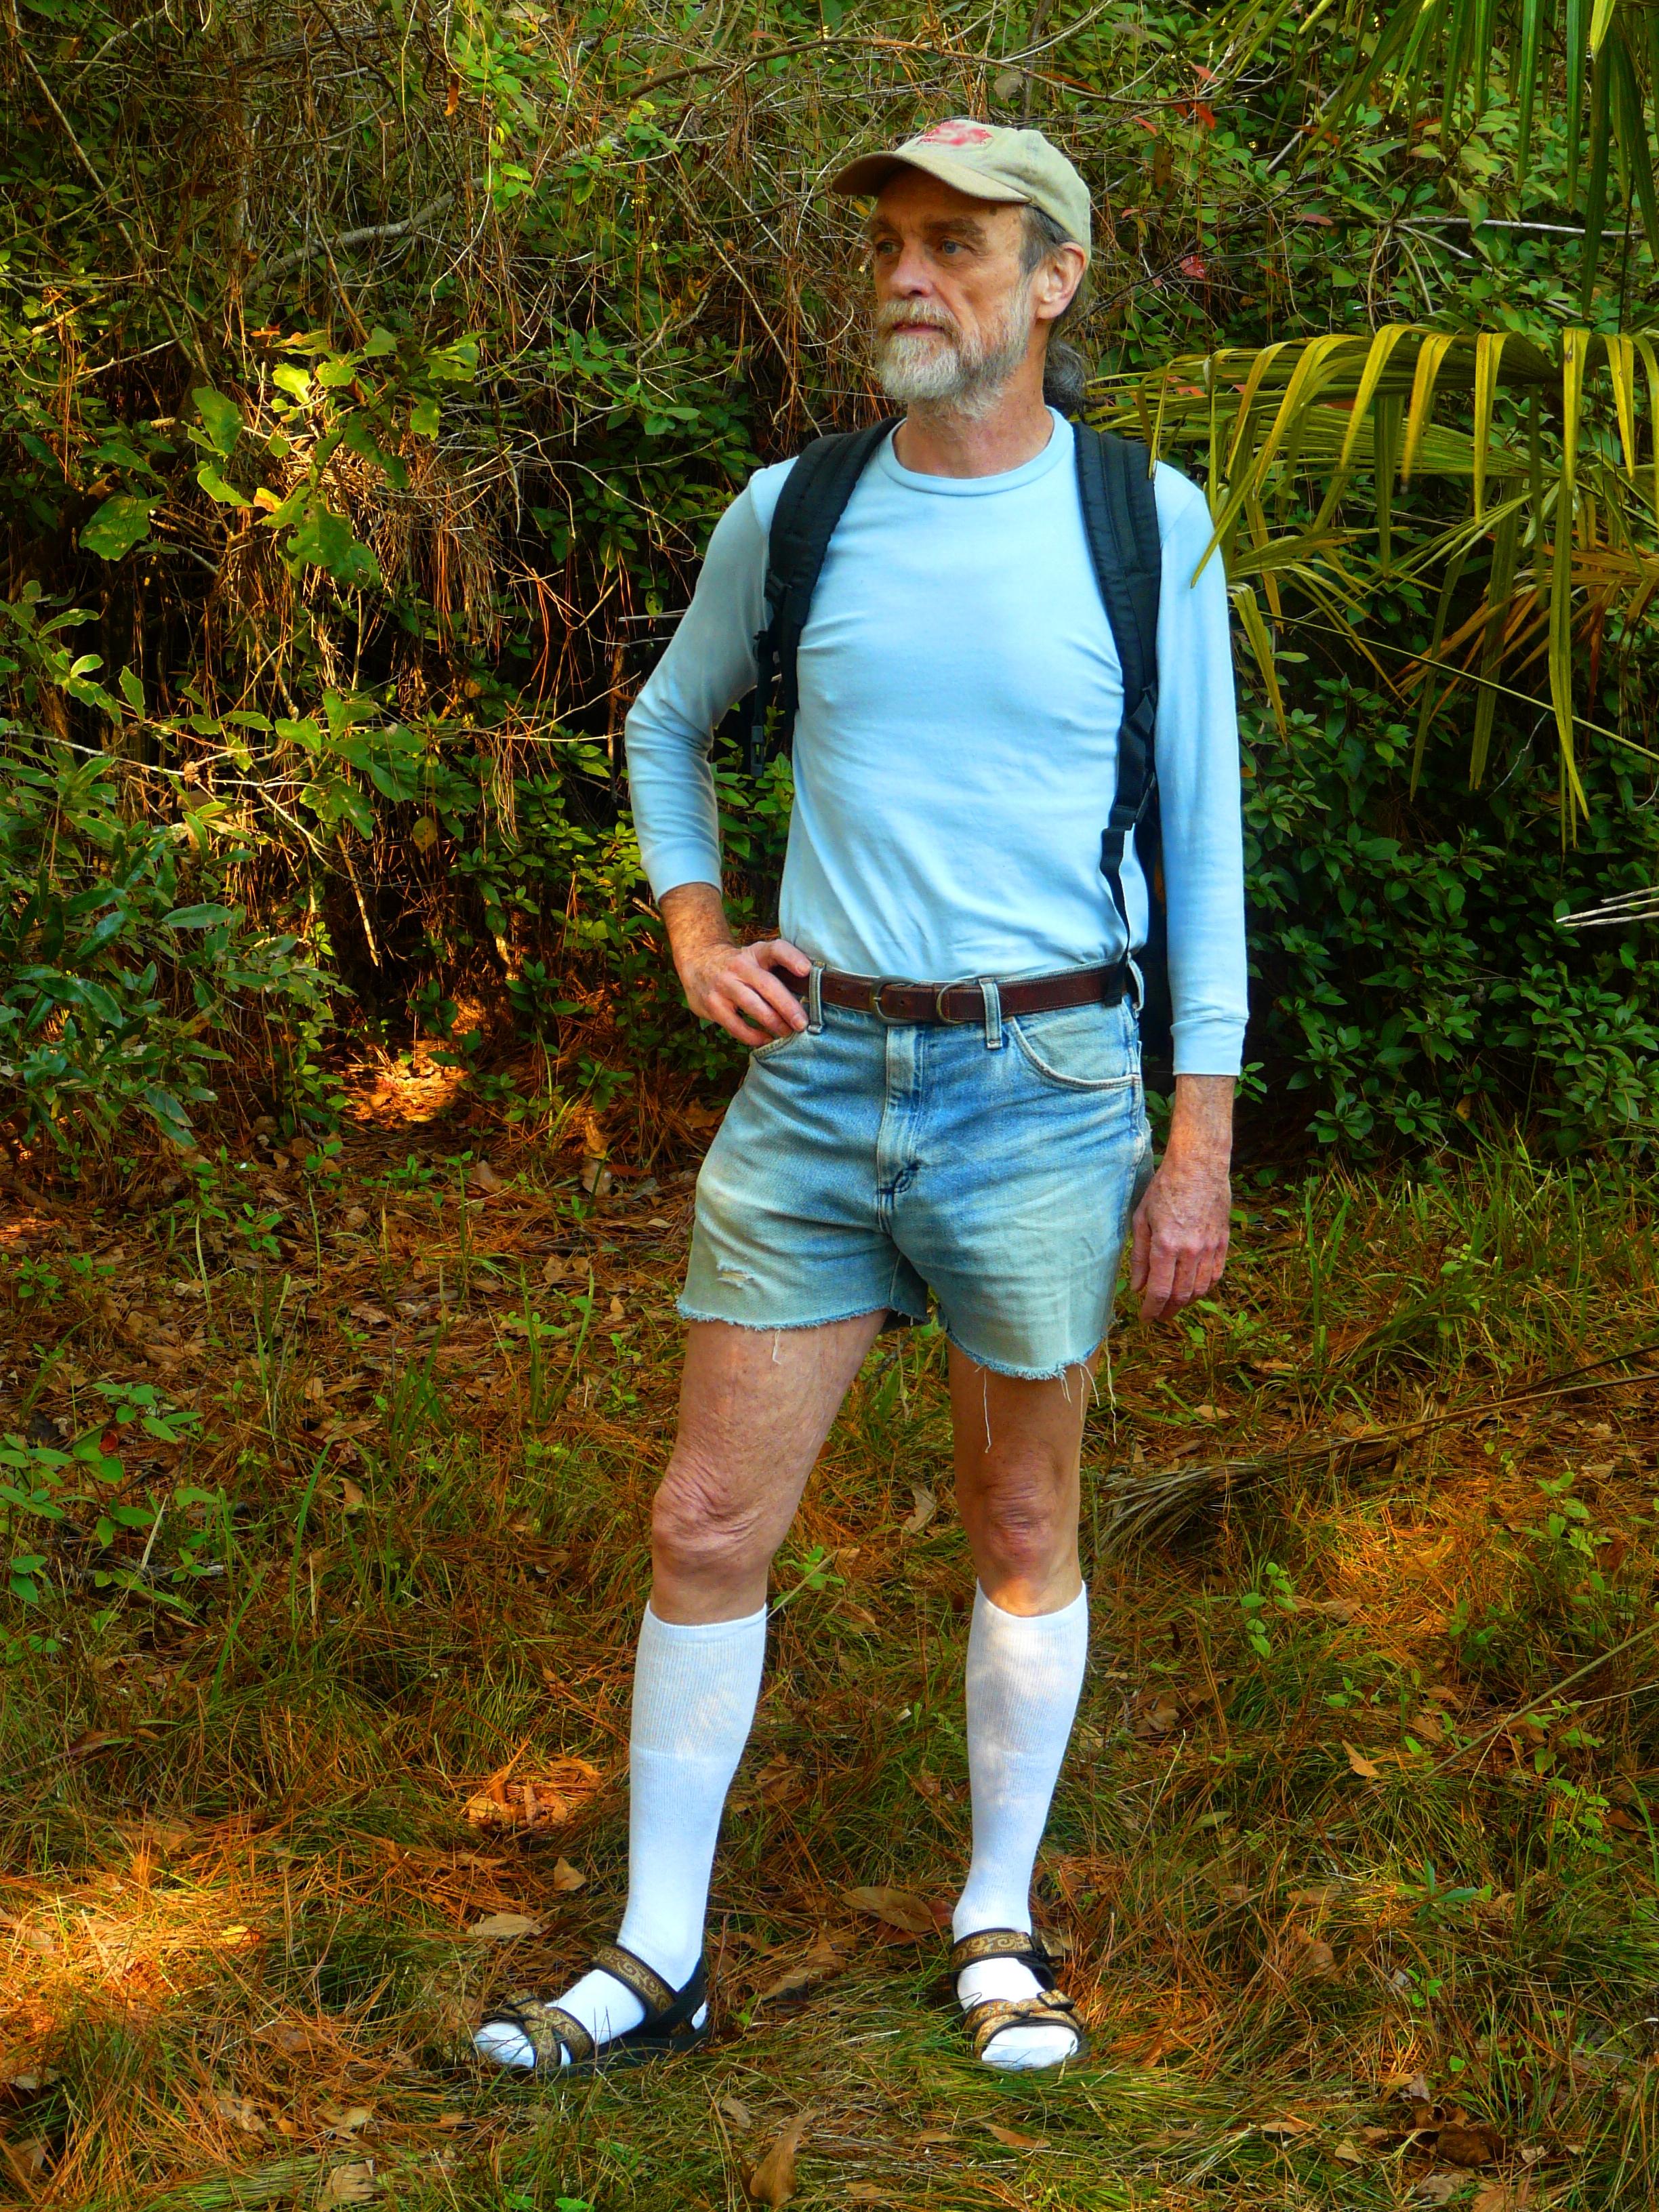 0b8273e9e8a Socks and sandals - Wikipedia